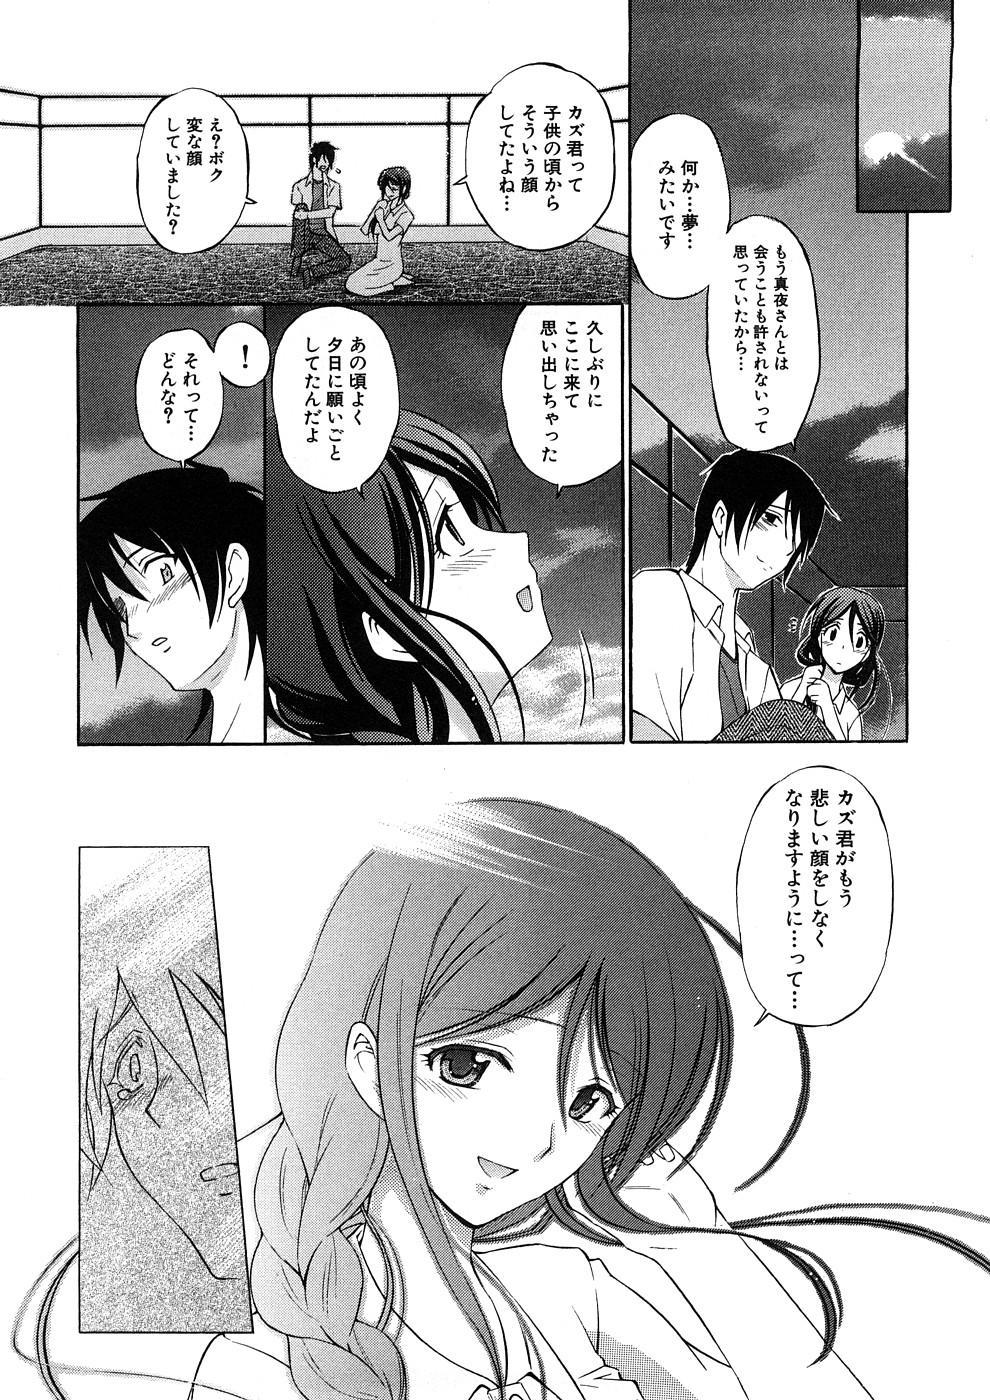 Geki Yaba Anthology Vol. 1 - Naka ni Dashite yo 24